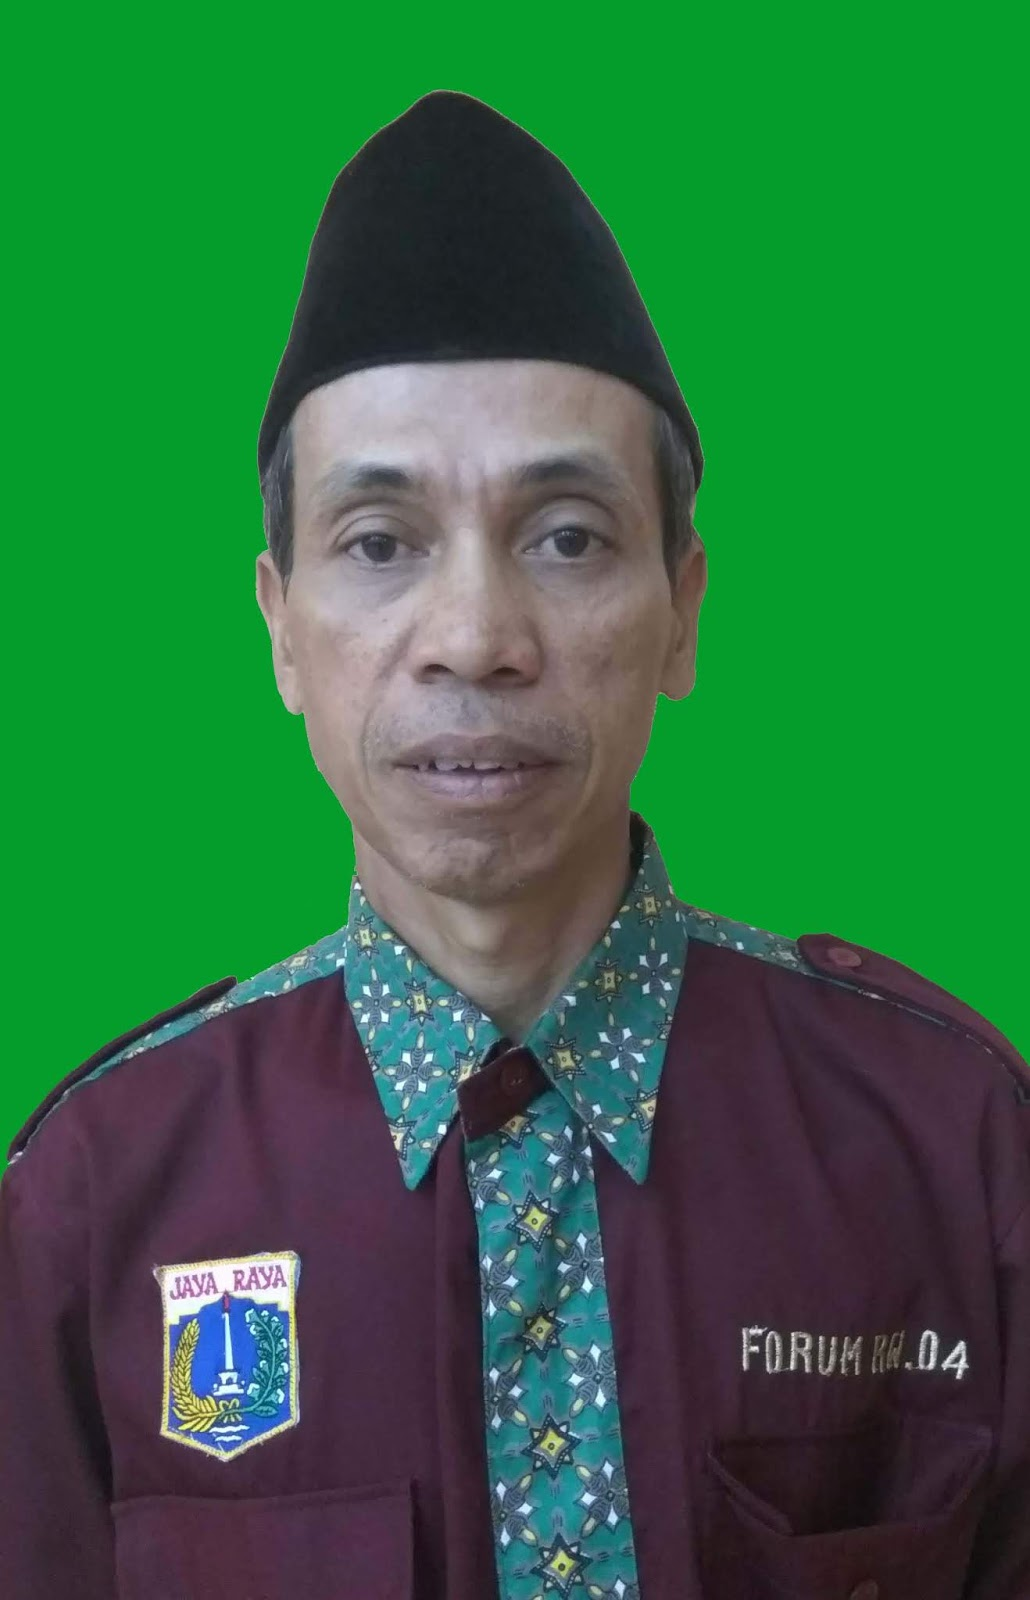 Ketua Rt 012 Media Informasi Rw 04 Kelurahan Bangka Jak Sel